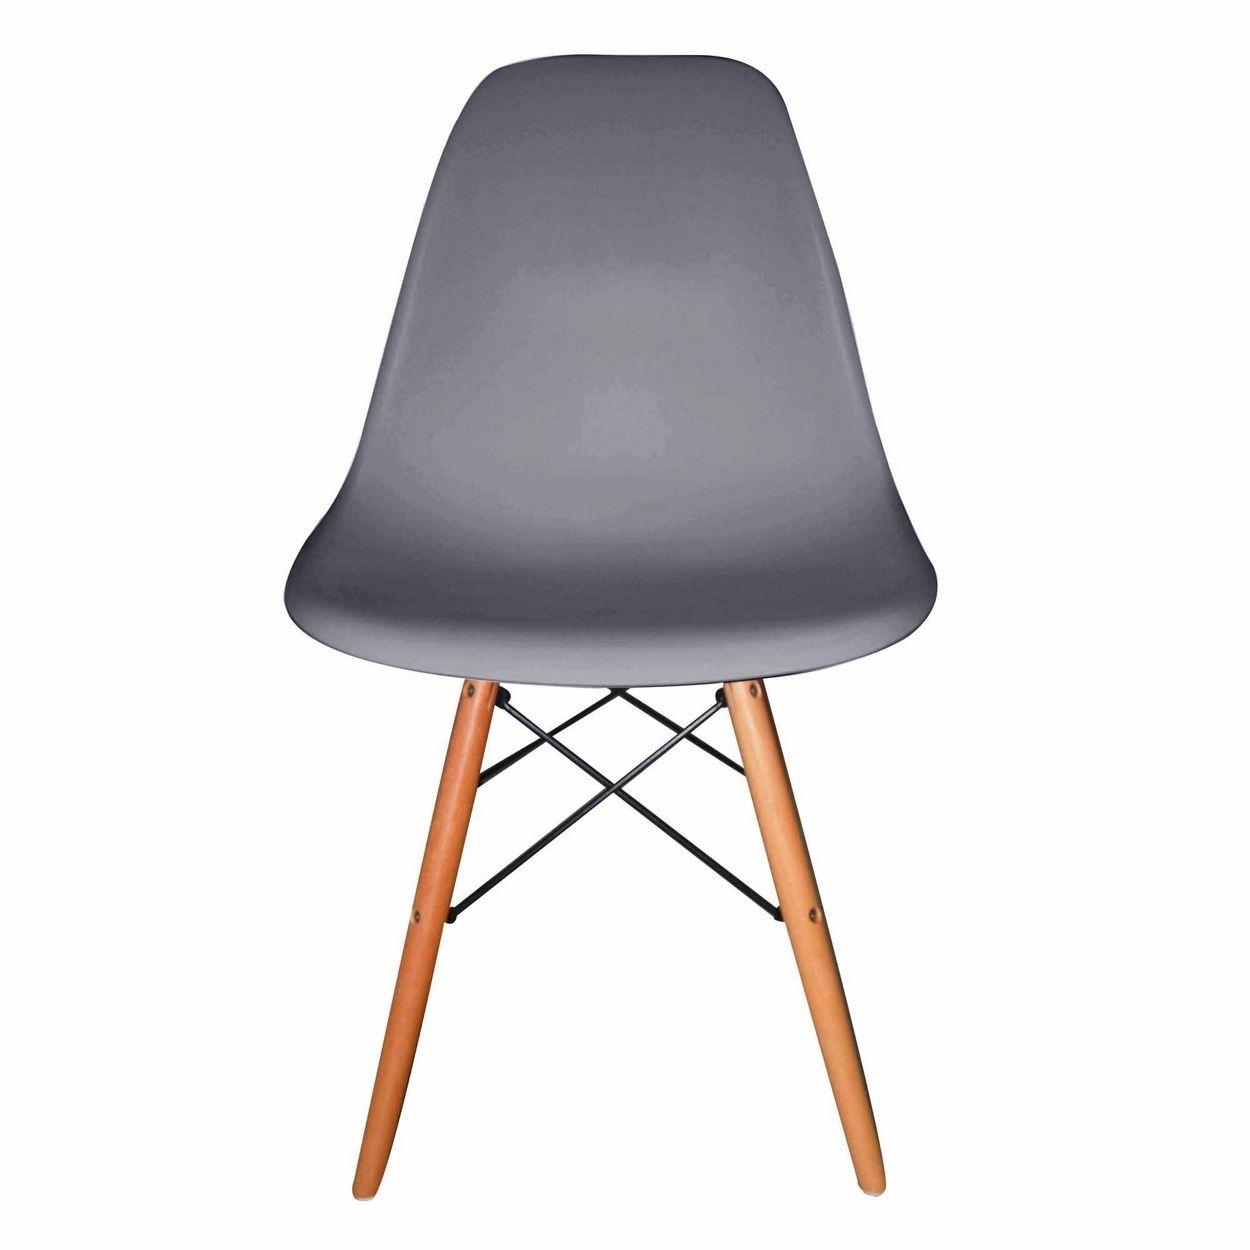 Debenhams Pair Of Grey Avignon Chairs At Dining Table ChairsDebenhams